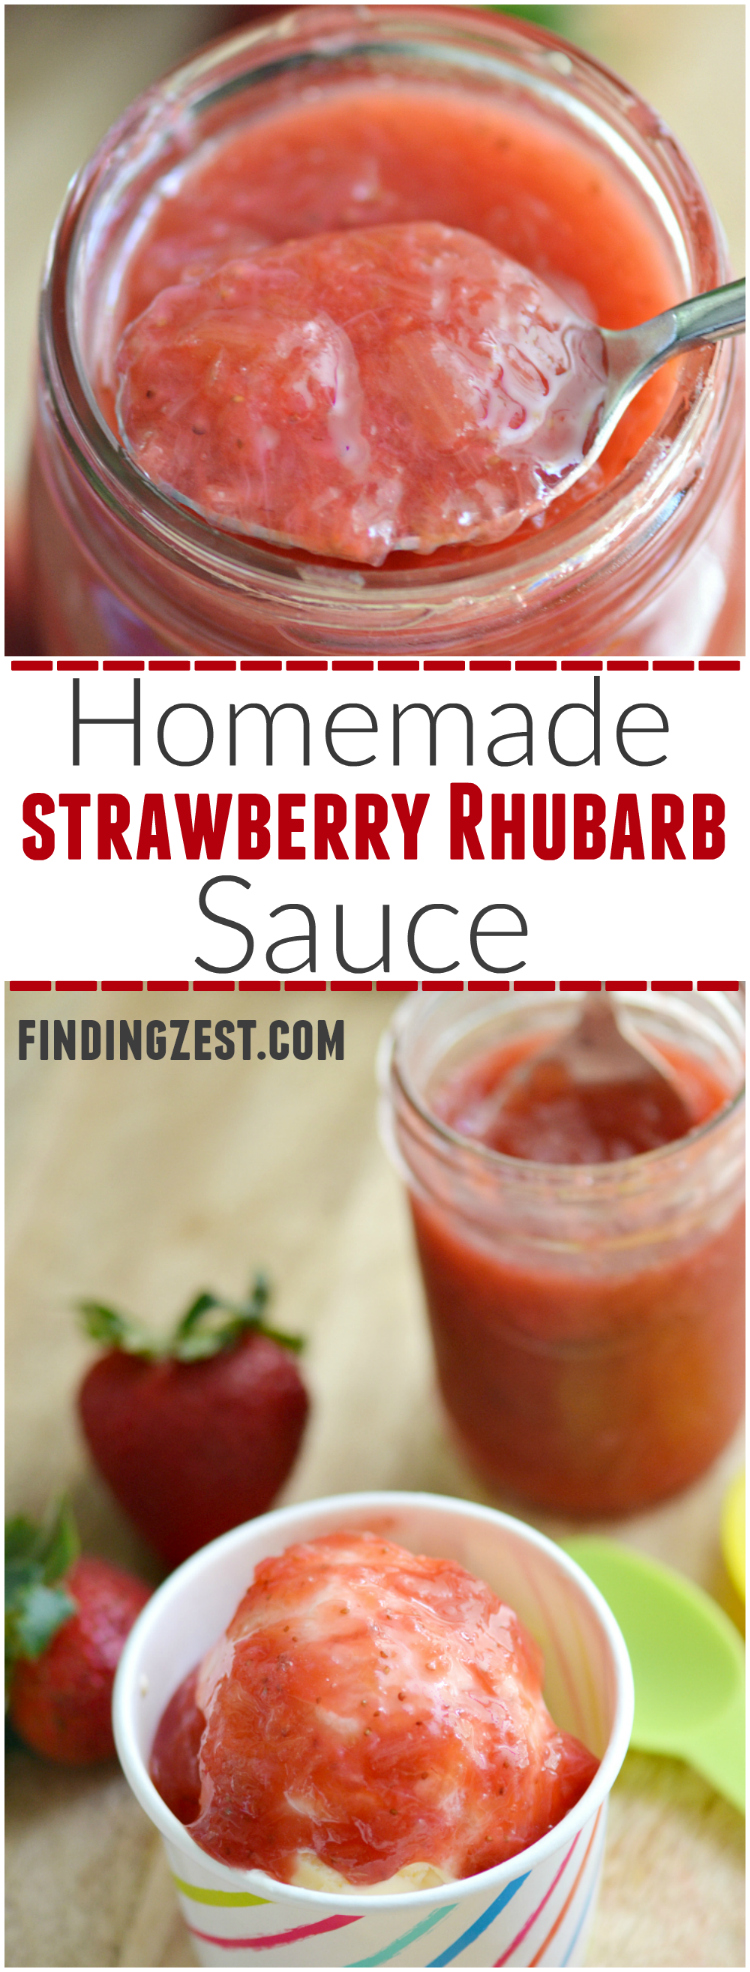 Easy Homemade Strawberry Rhubarb Sauce